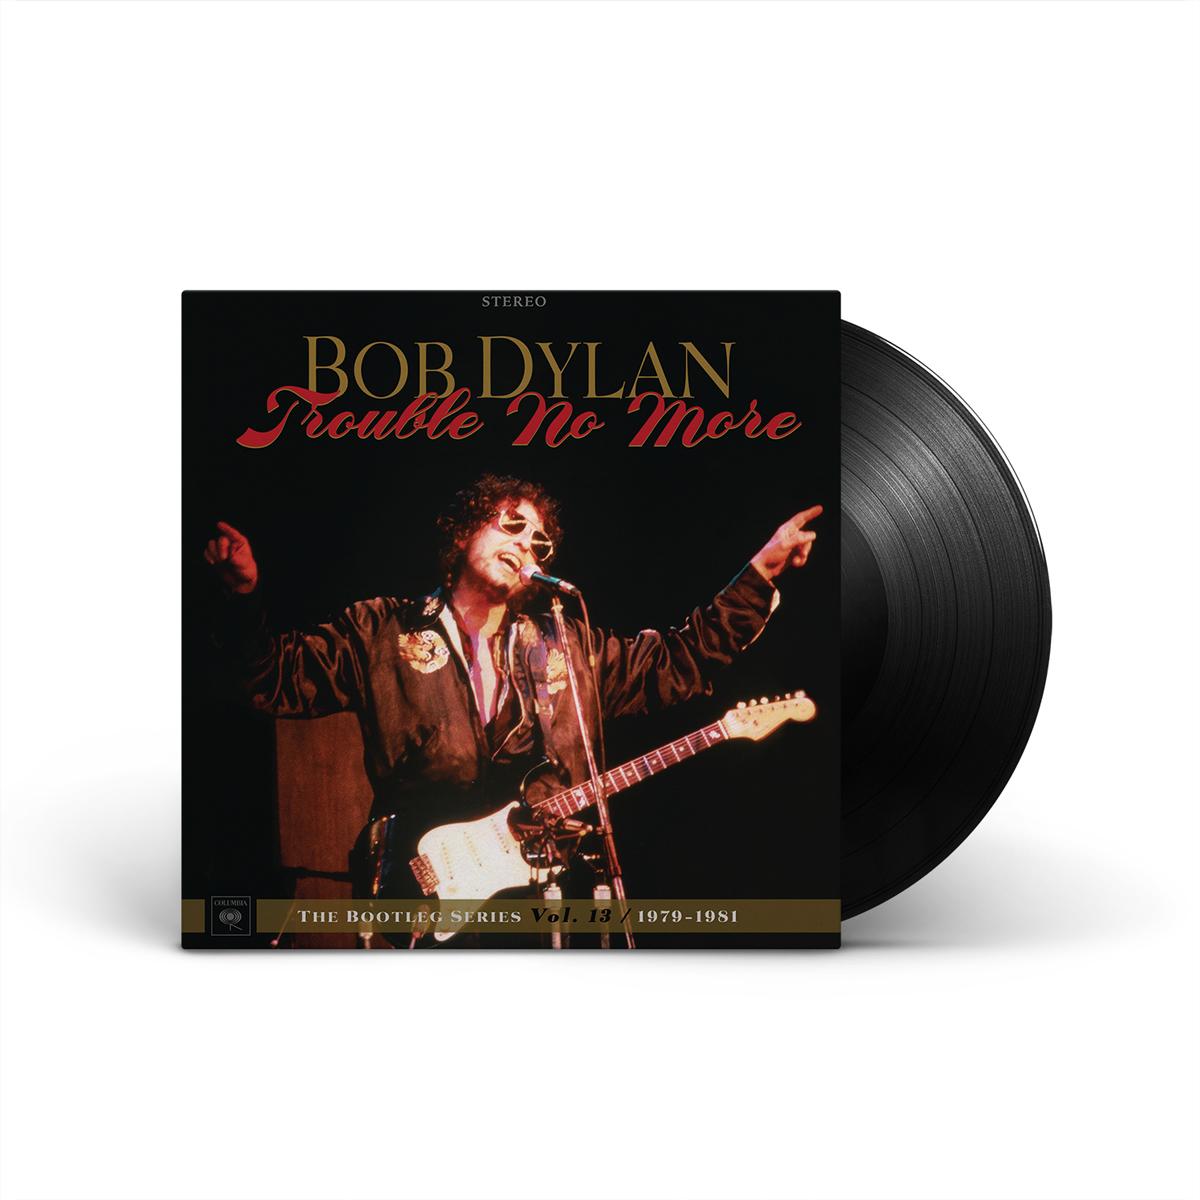 Bob Dylan Trouble No More: The Bootleg Series Vol. 13 / 1979-1981 (4 LP Standard Box)